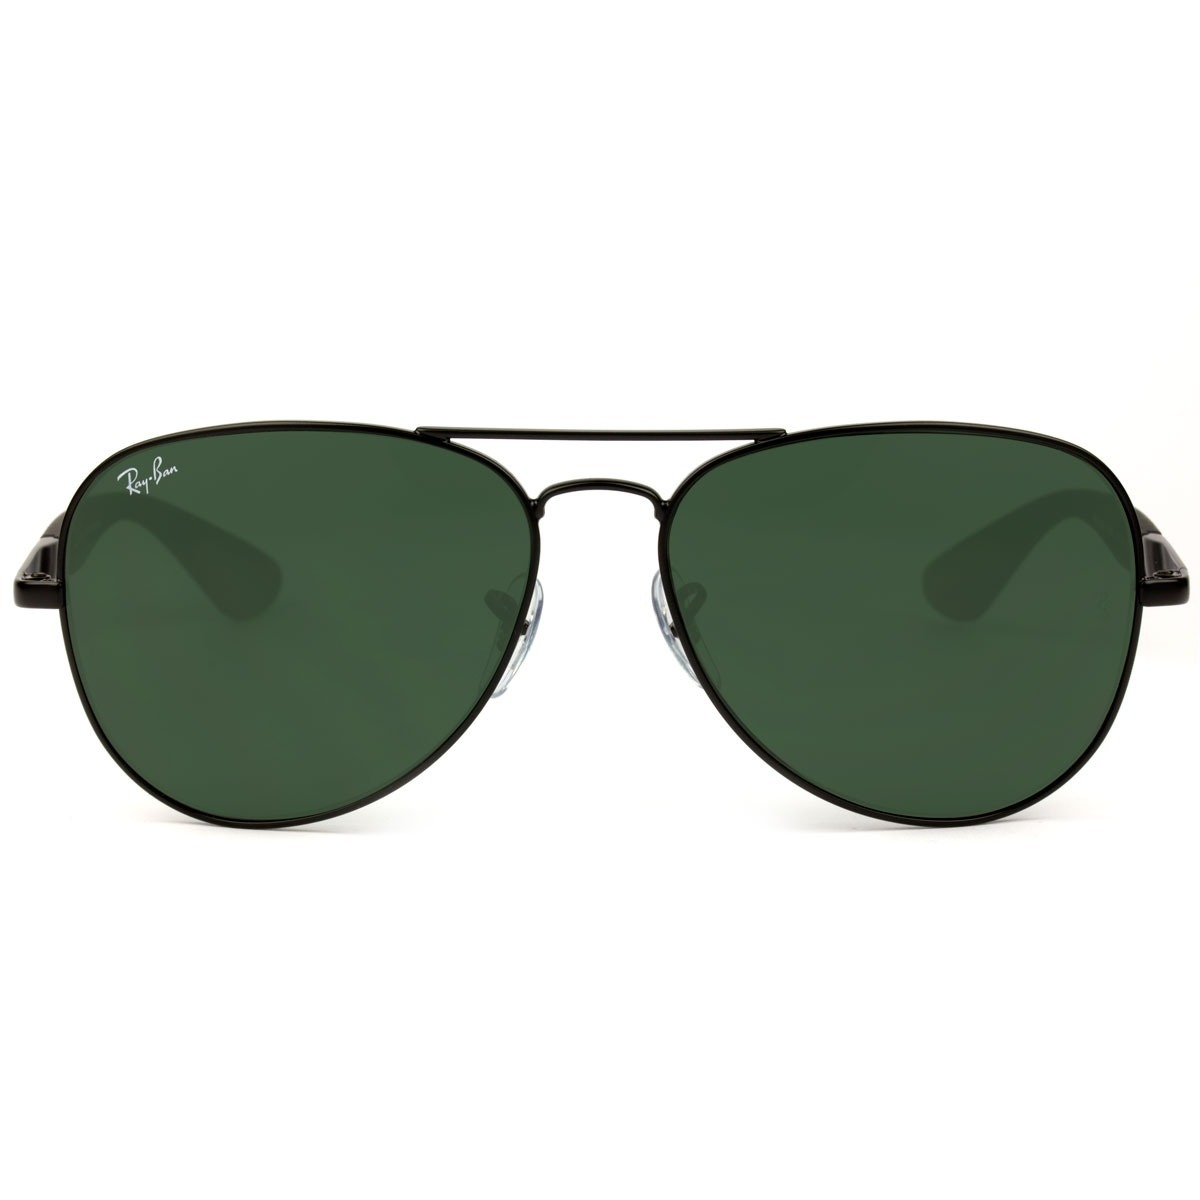 Carregando zoom... óculos ray ban aviador rb3554l 006 71 58 - nota fiscal 98a671f50b